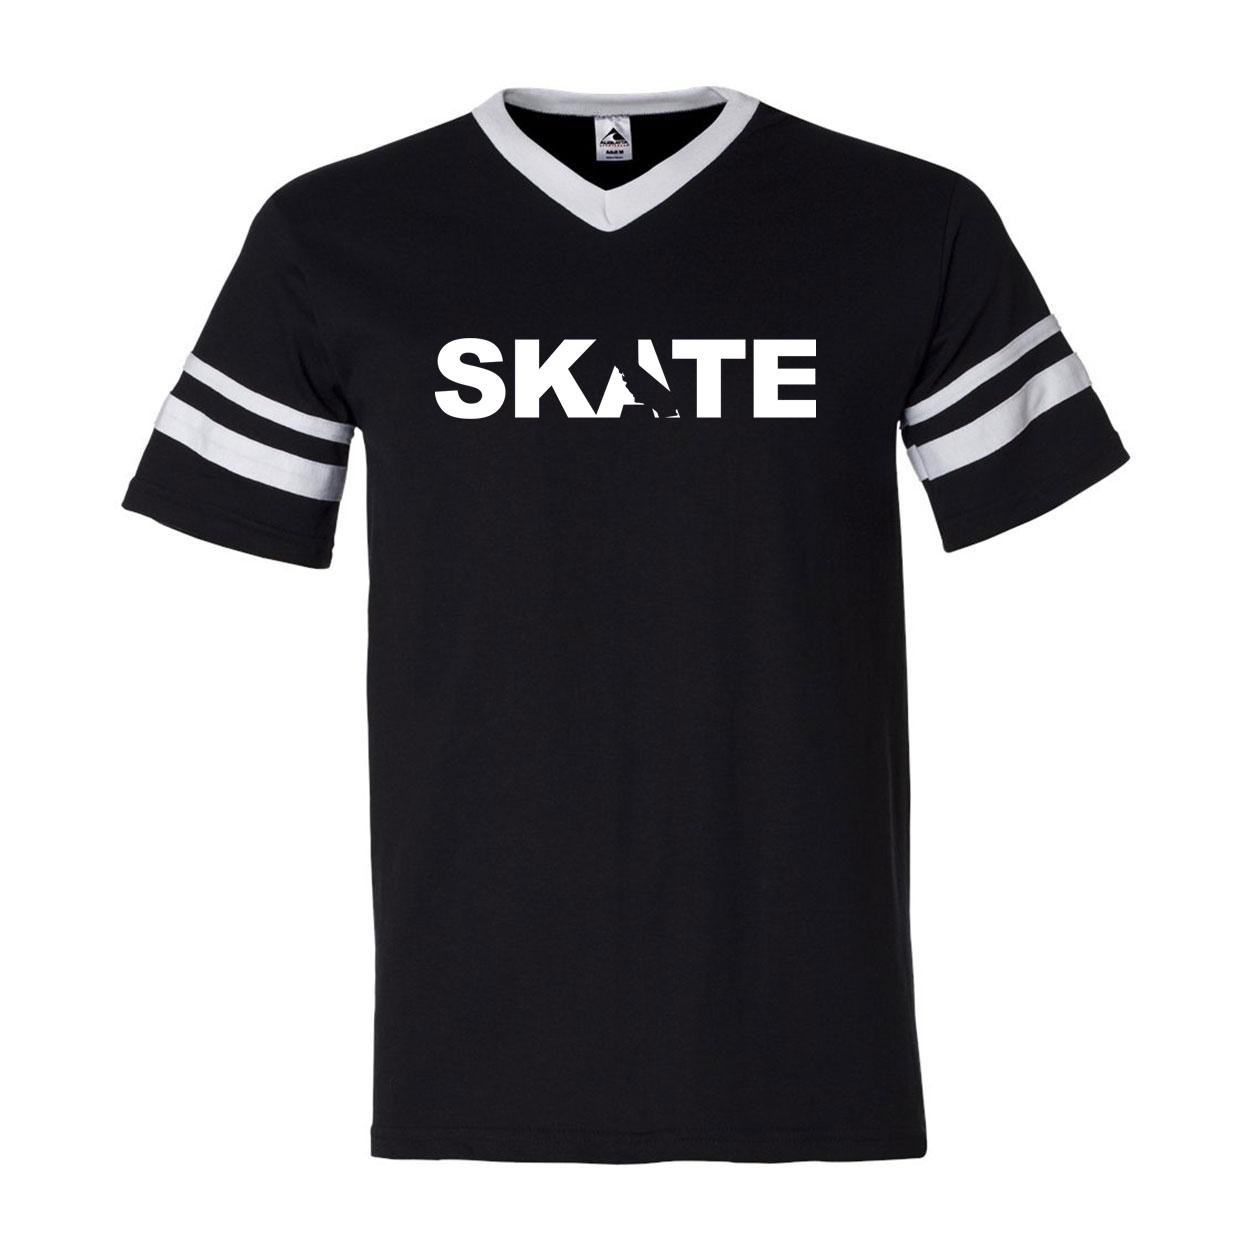 Skate California Classic Premium Striped Jersey T-Shirt Black/White (White Logo)